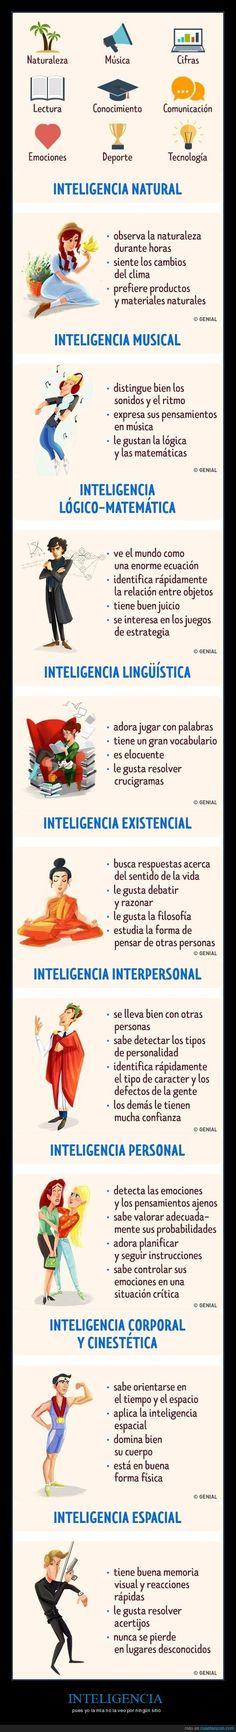 Distintos tipos de inteligencia